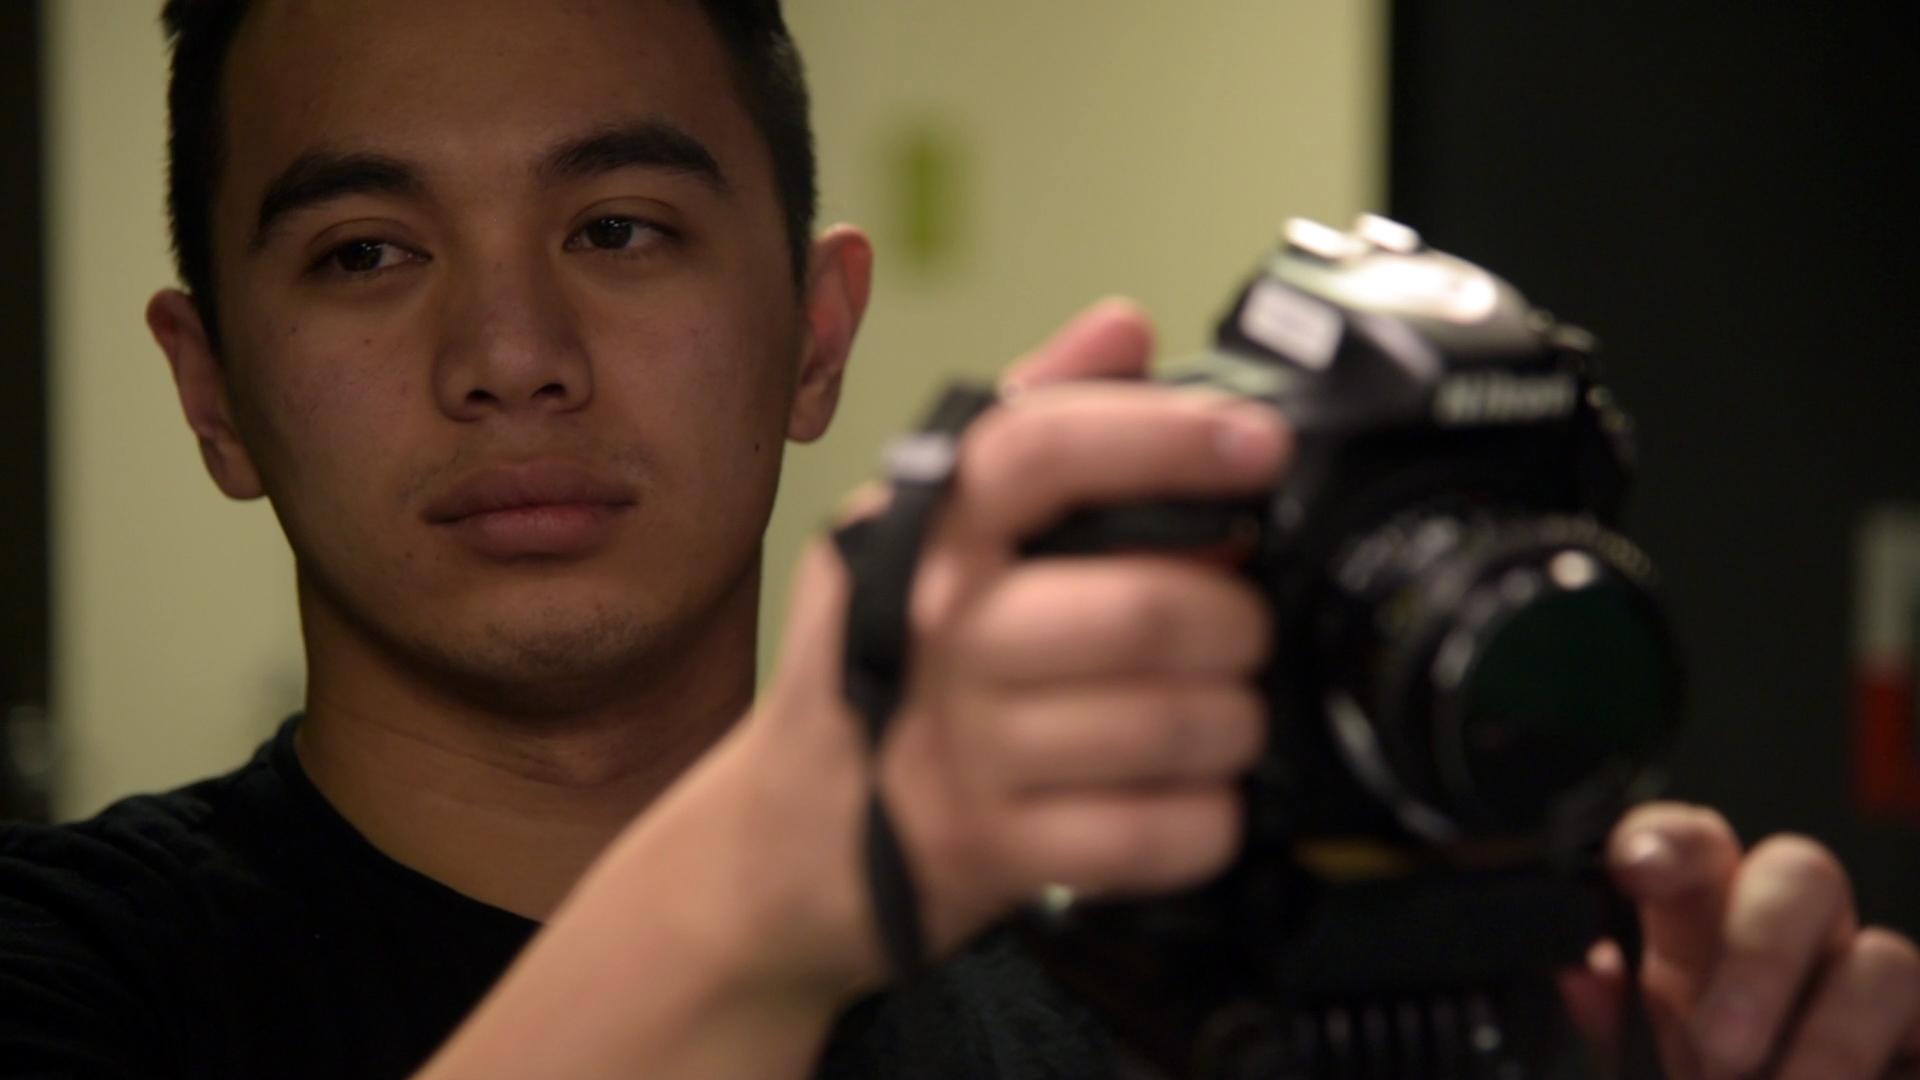 Gabriel Kotico behind the scenes on the set of Geena Matuson's (@geenamatuson) film shoot, 2019. Cinematography by Matthew DeVirgilio. See more @ geenamatuson.com.